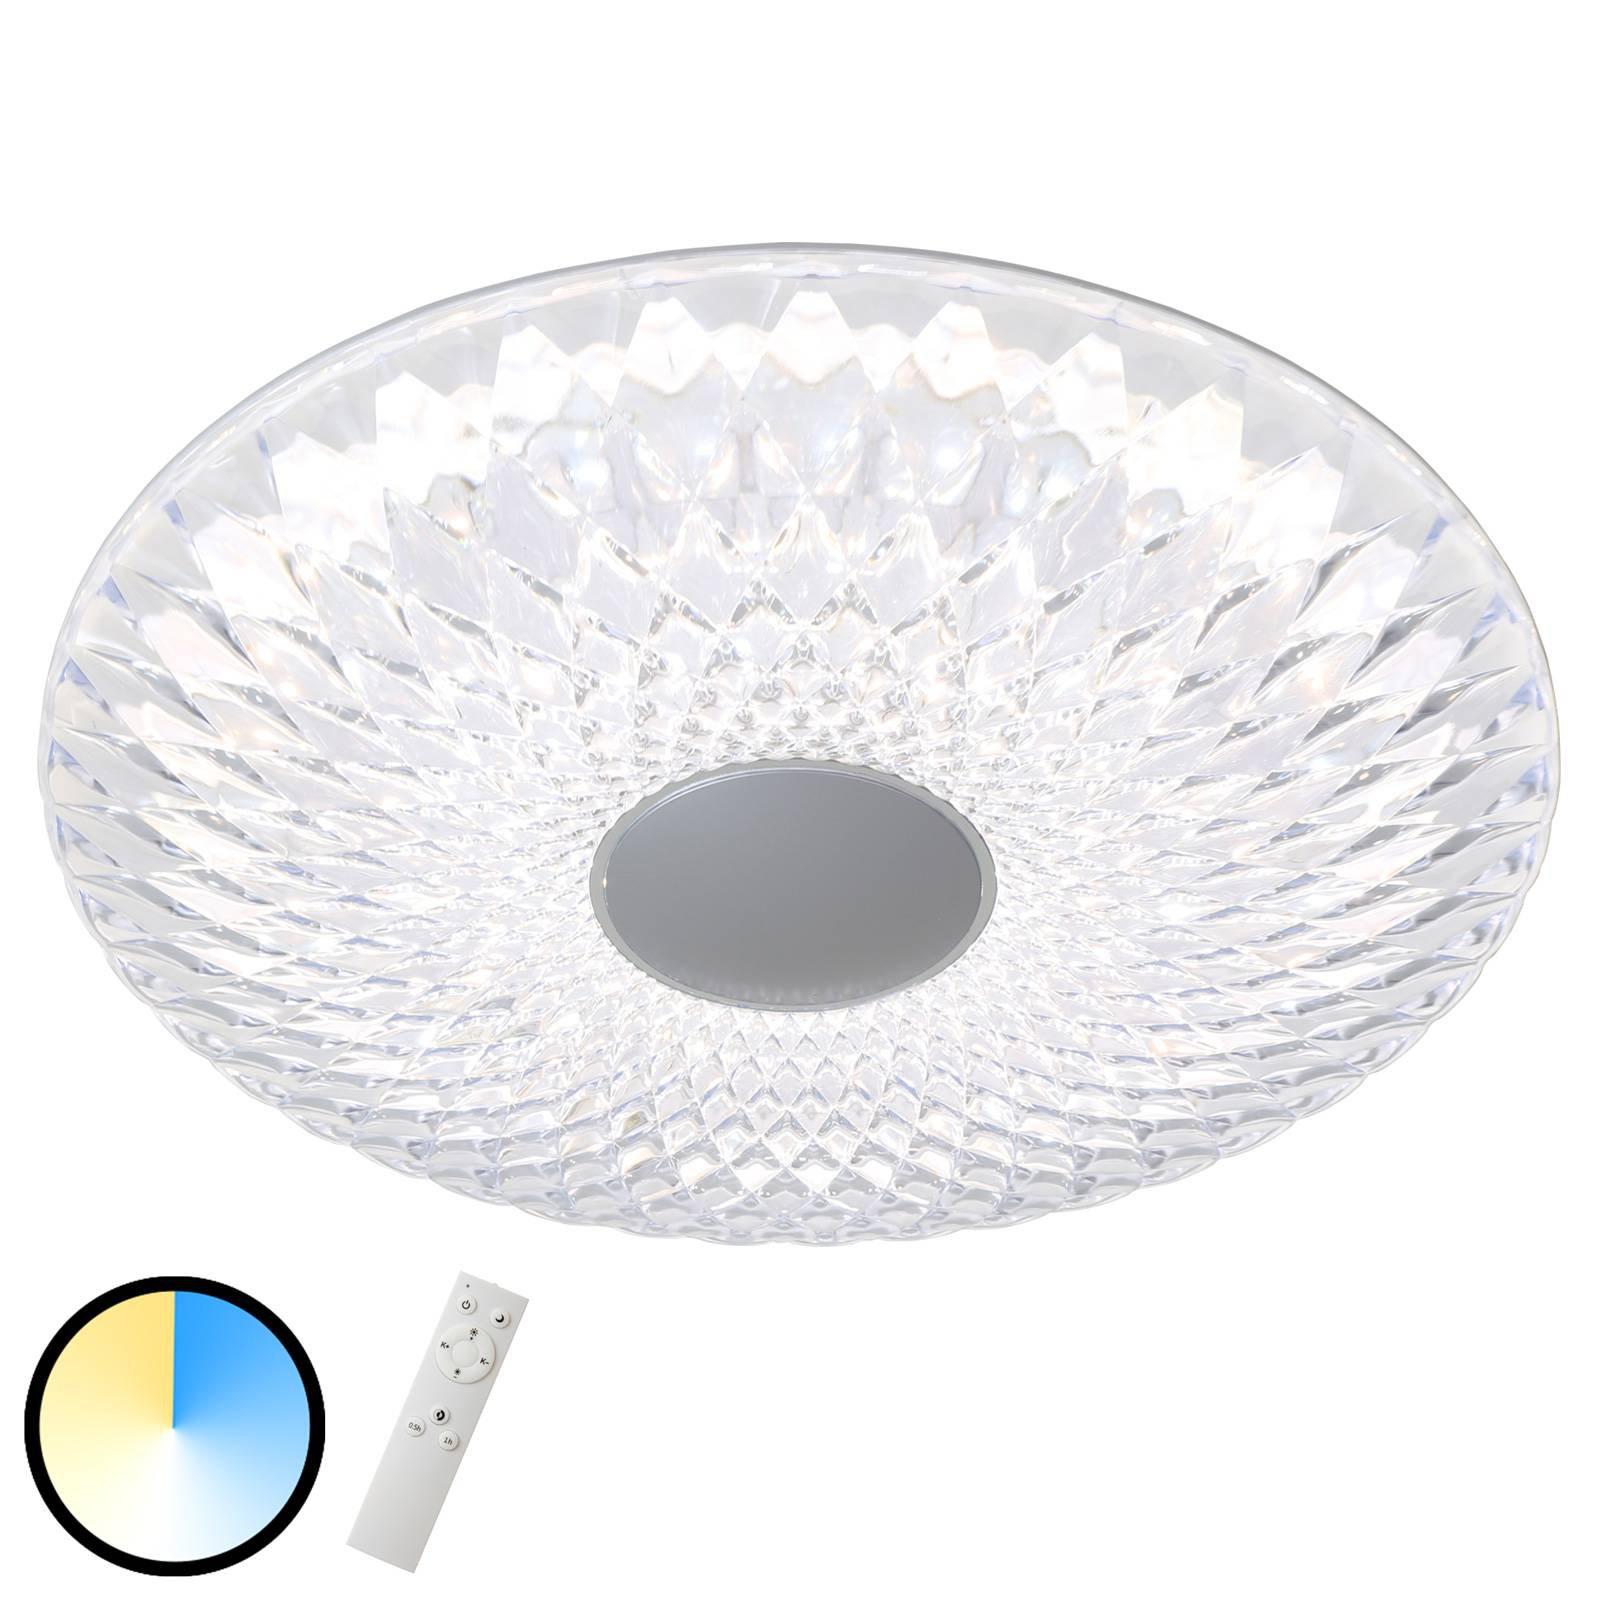 LED-taklampe 3354-010 Space med fjernkontroll